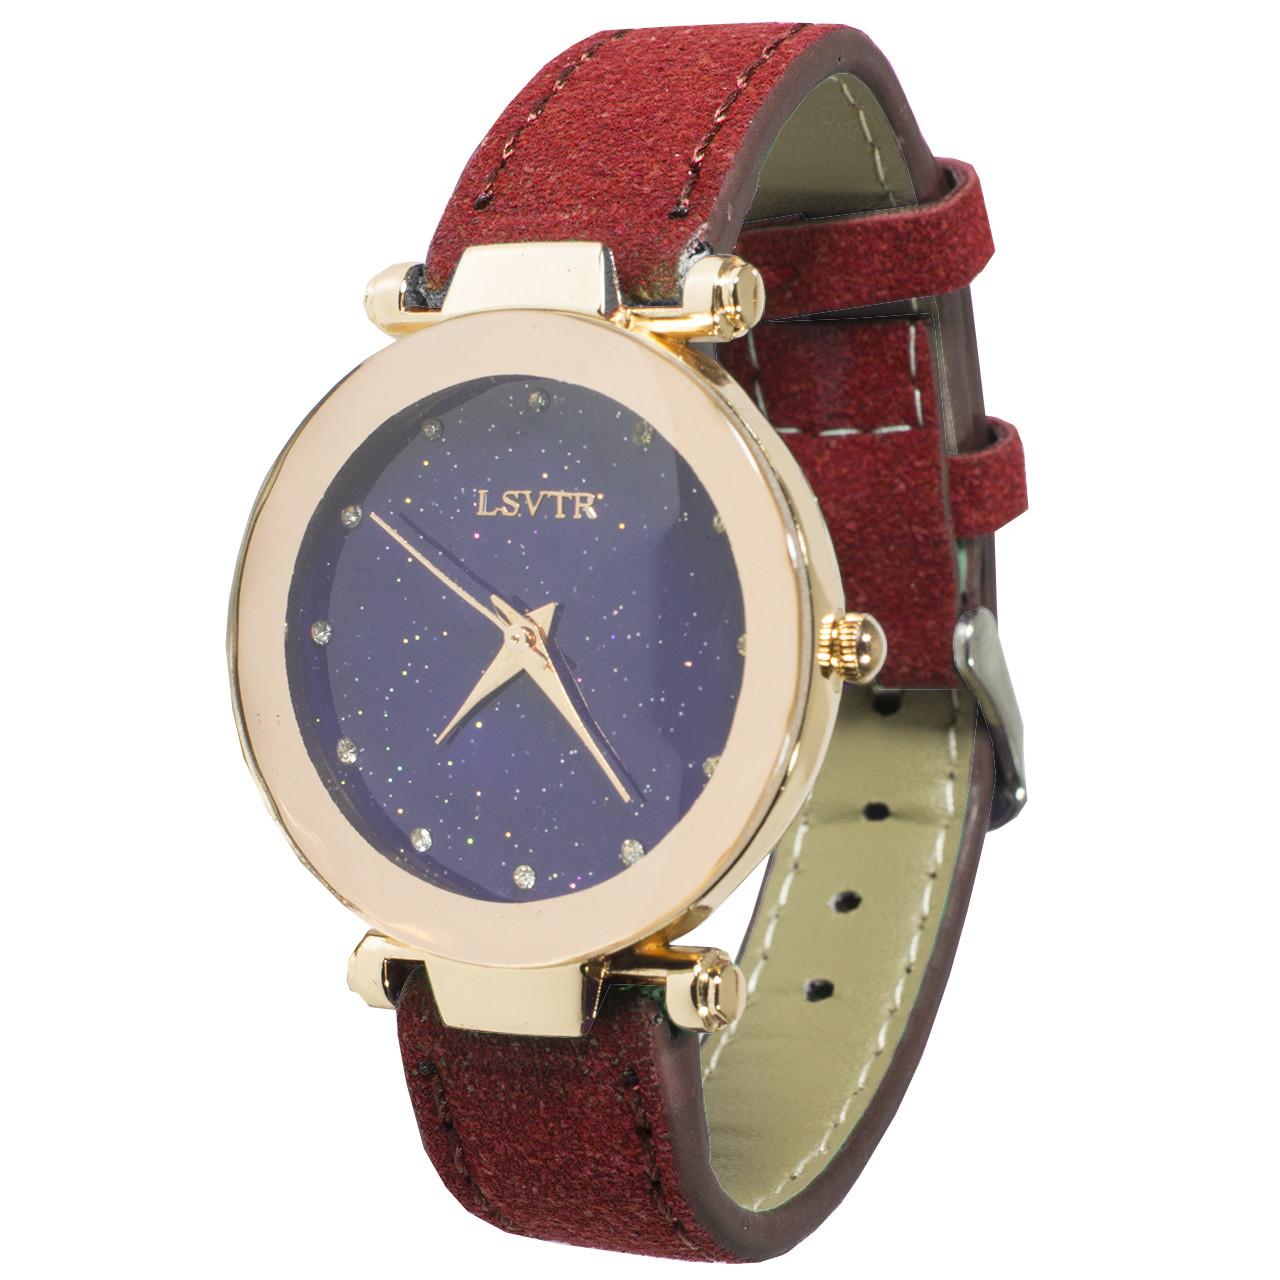 f5d1e392bcda ☛Наручные часы LSVTR Fashion Red женские на основе кварцевого механизма  стильный ...